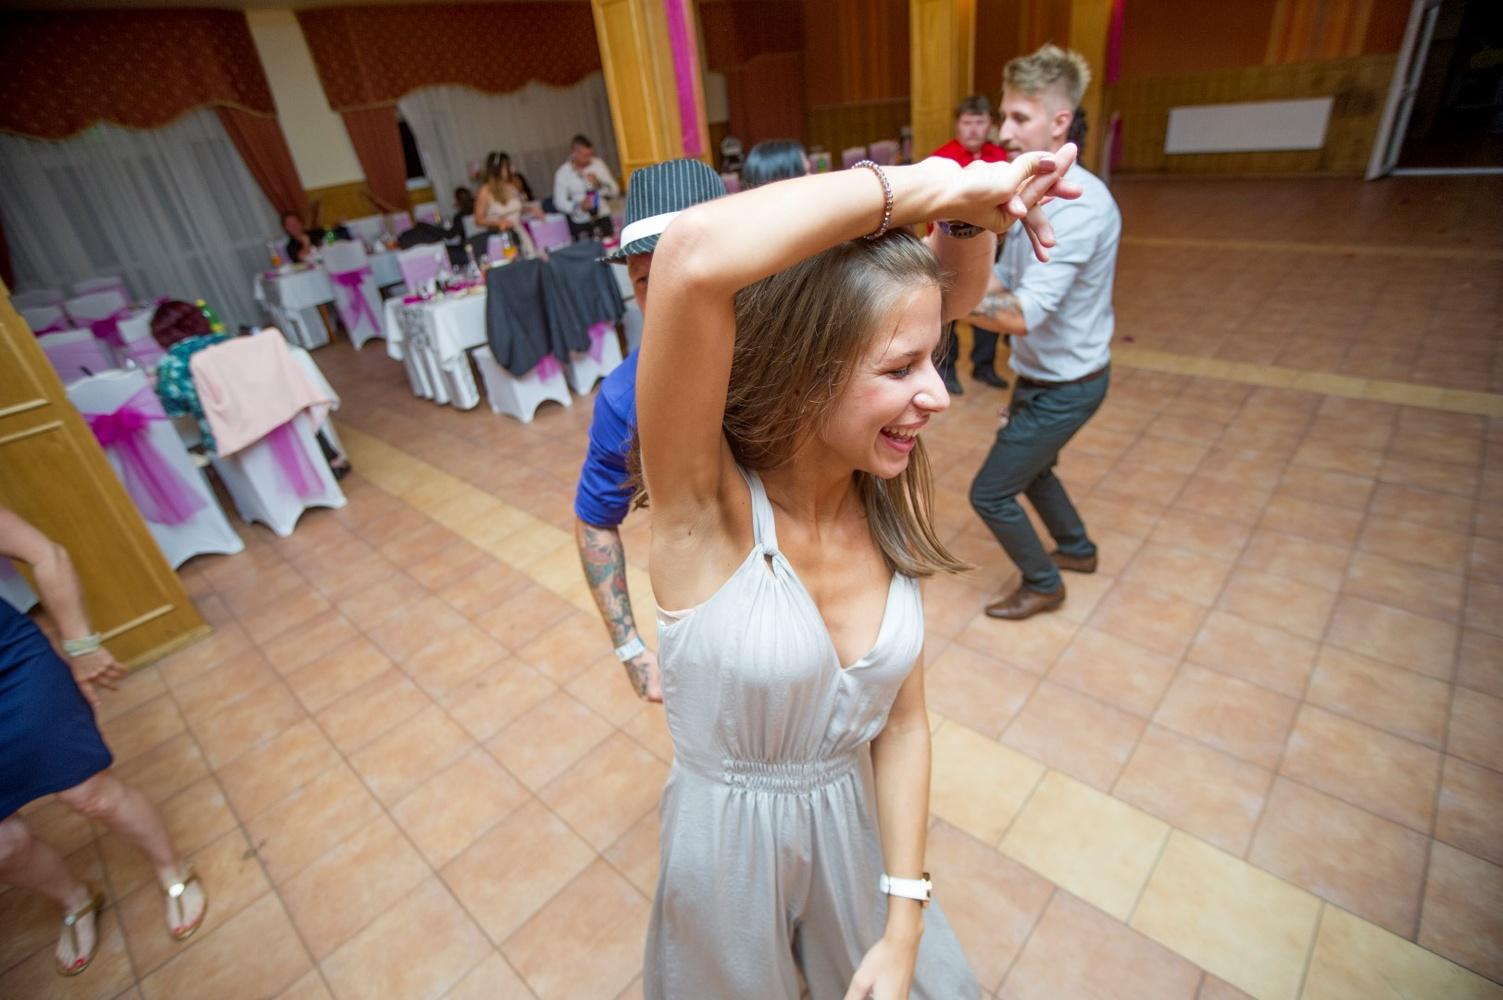 http://www.fotoz.sk/images/gallery-13/normal/eskuvo_vintop-karko_208.jpg